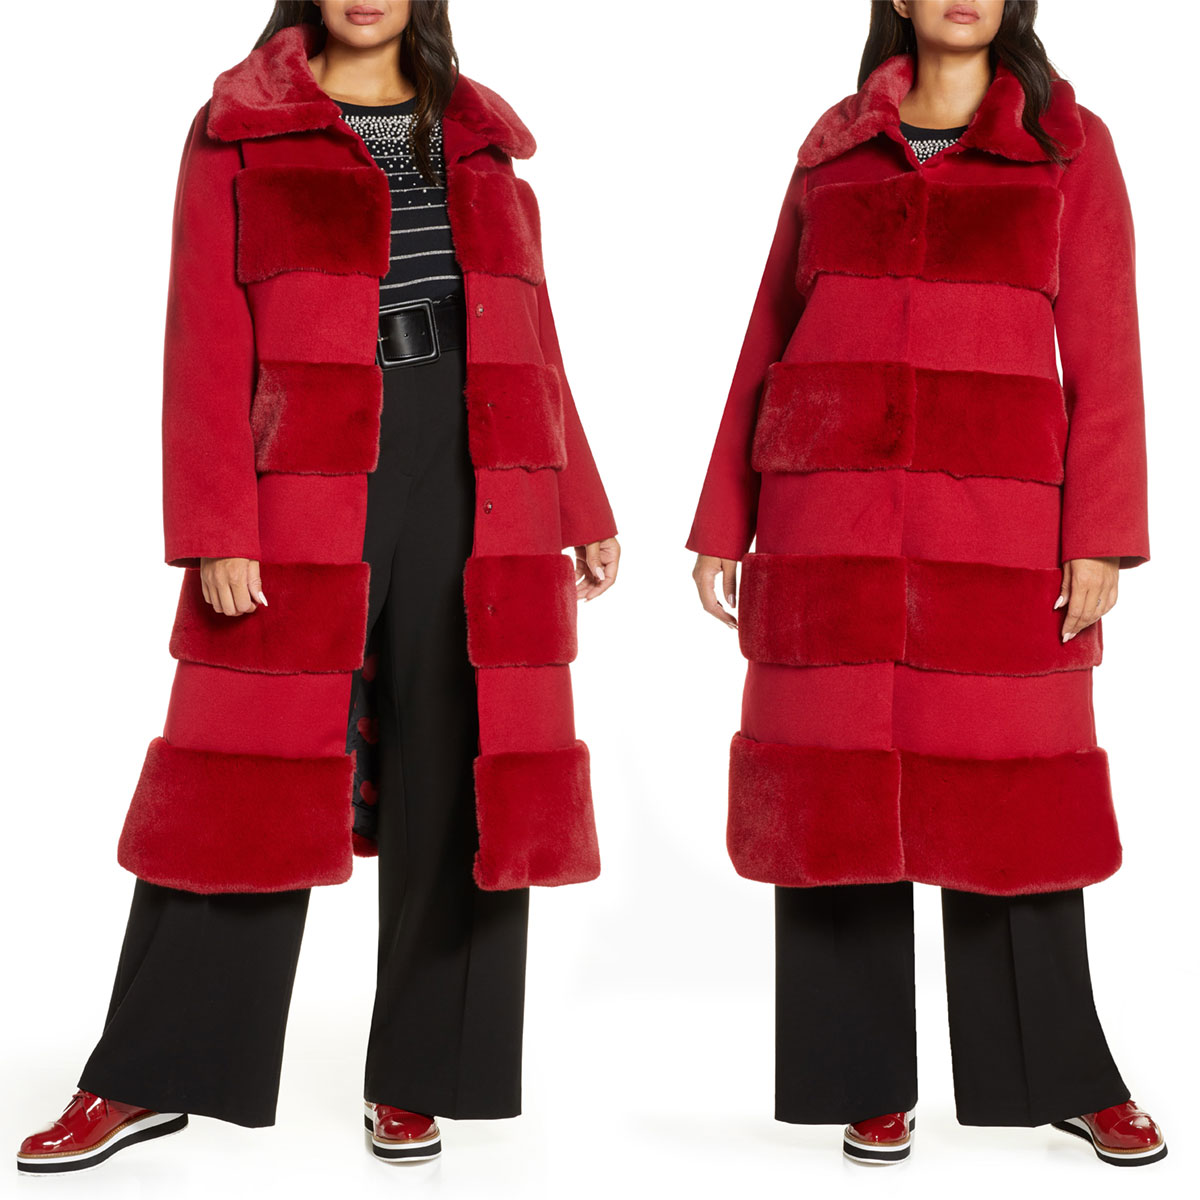 Halogen x Atlantic Pacific Faux Fur Tiered Stripe Long Coat